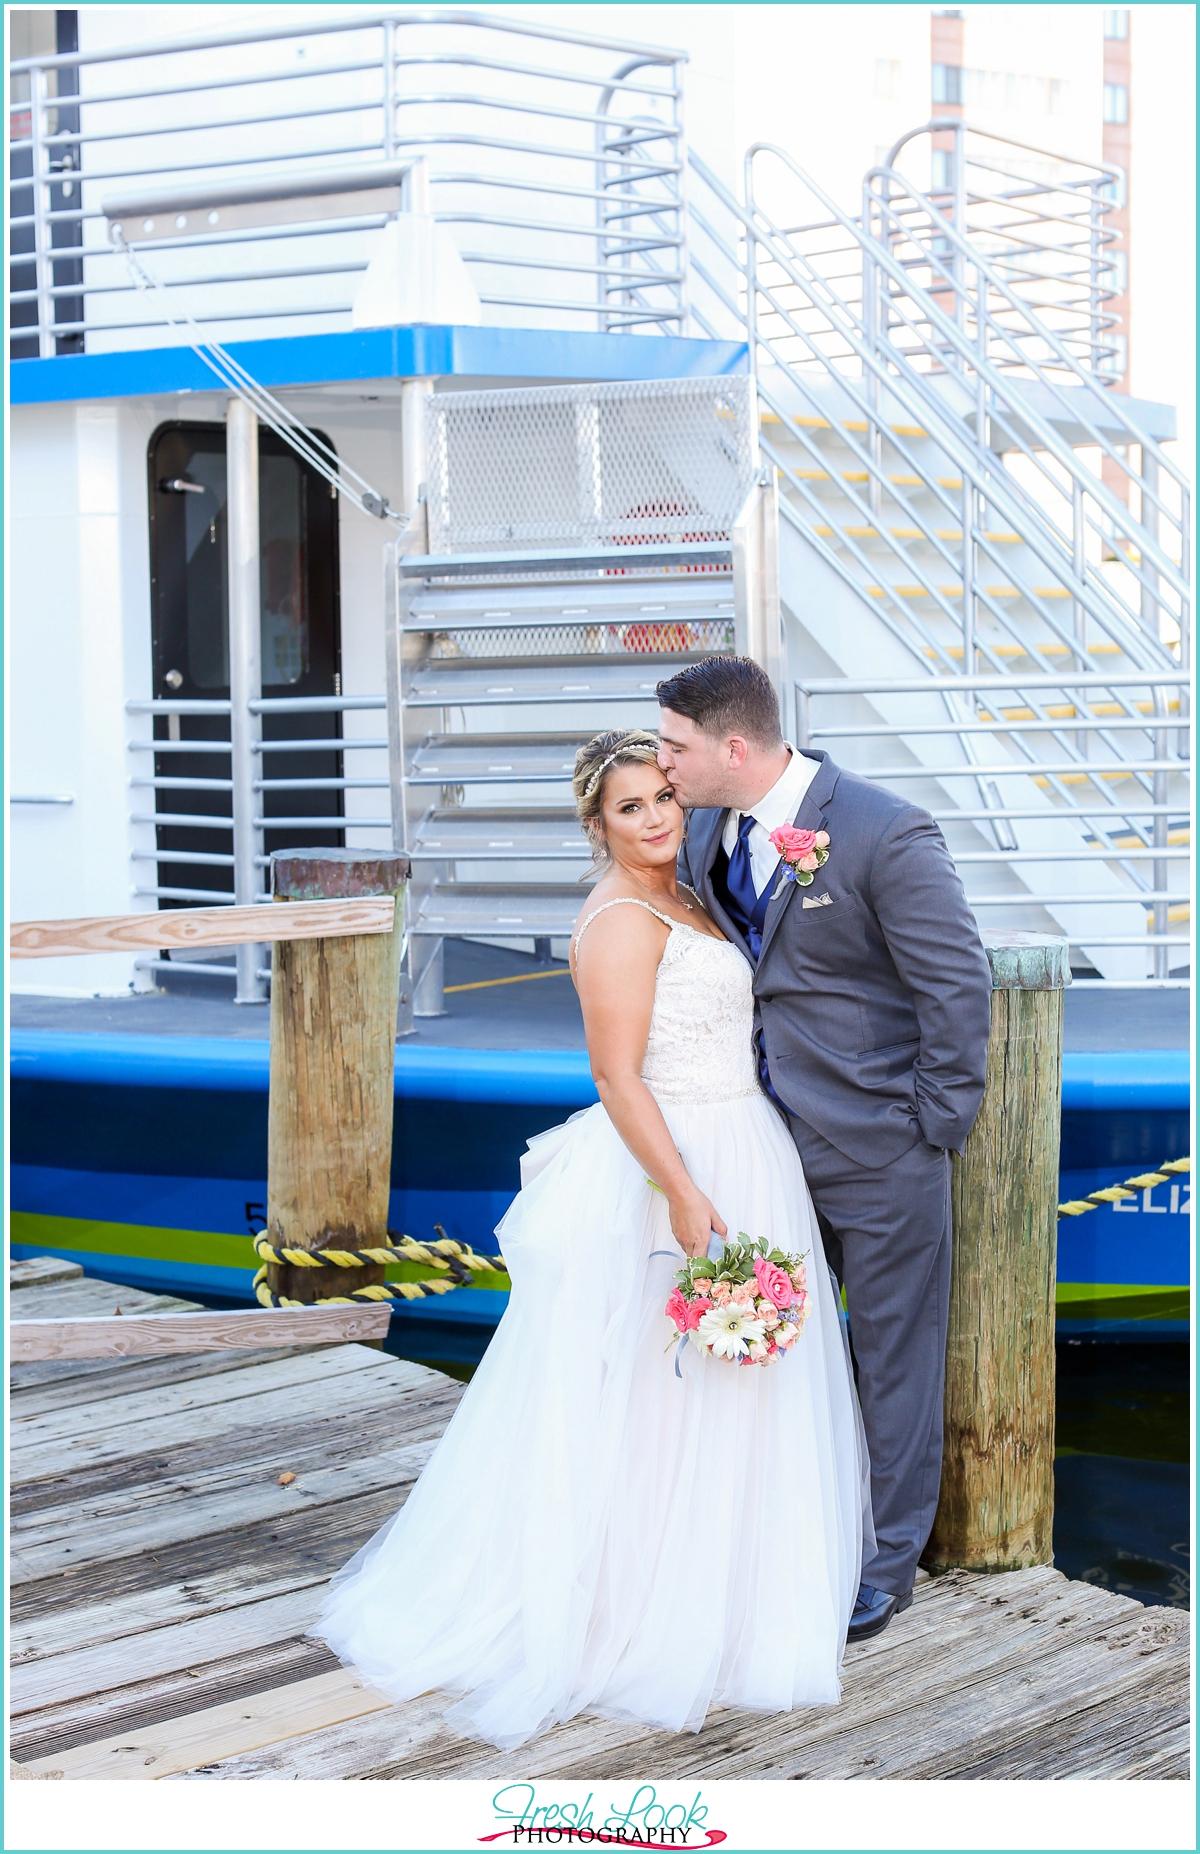 Renaissance Hotel Portsmouth Wedding | Anna+Nick - JudithsFreshLook.com